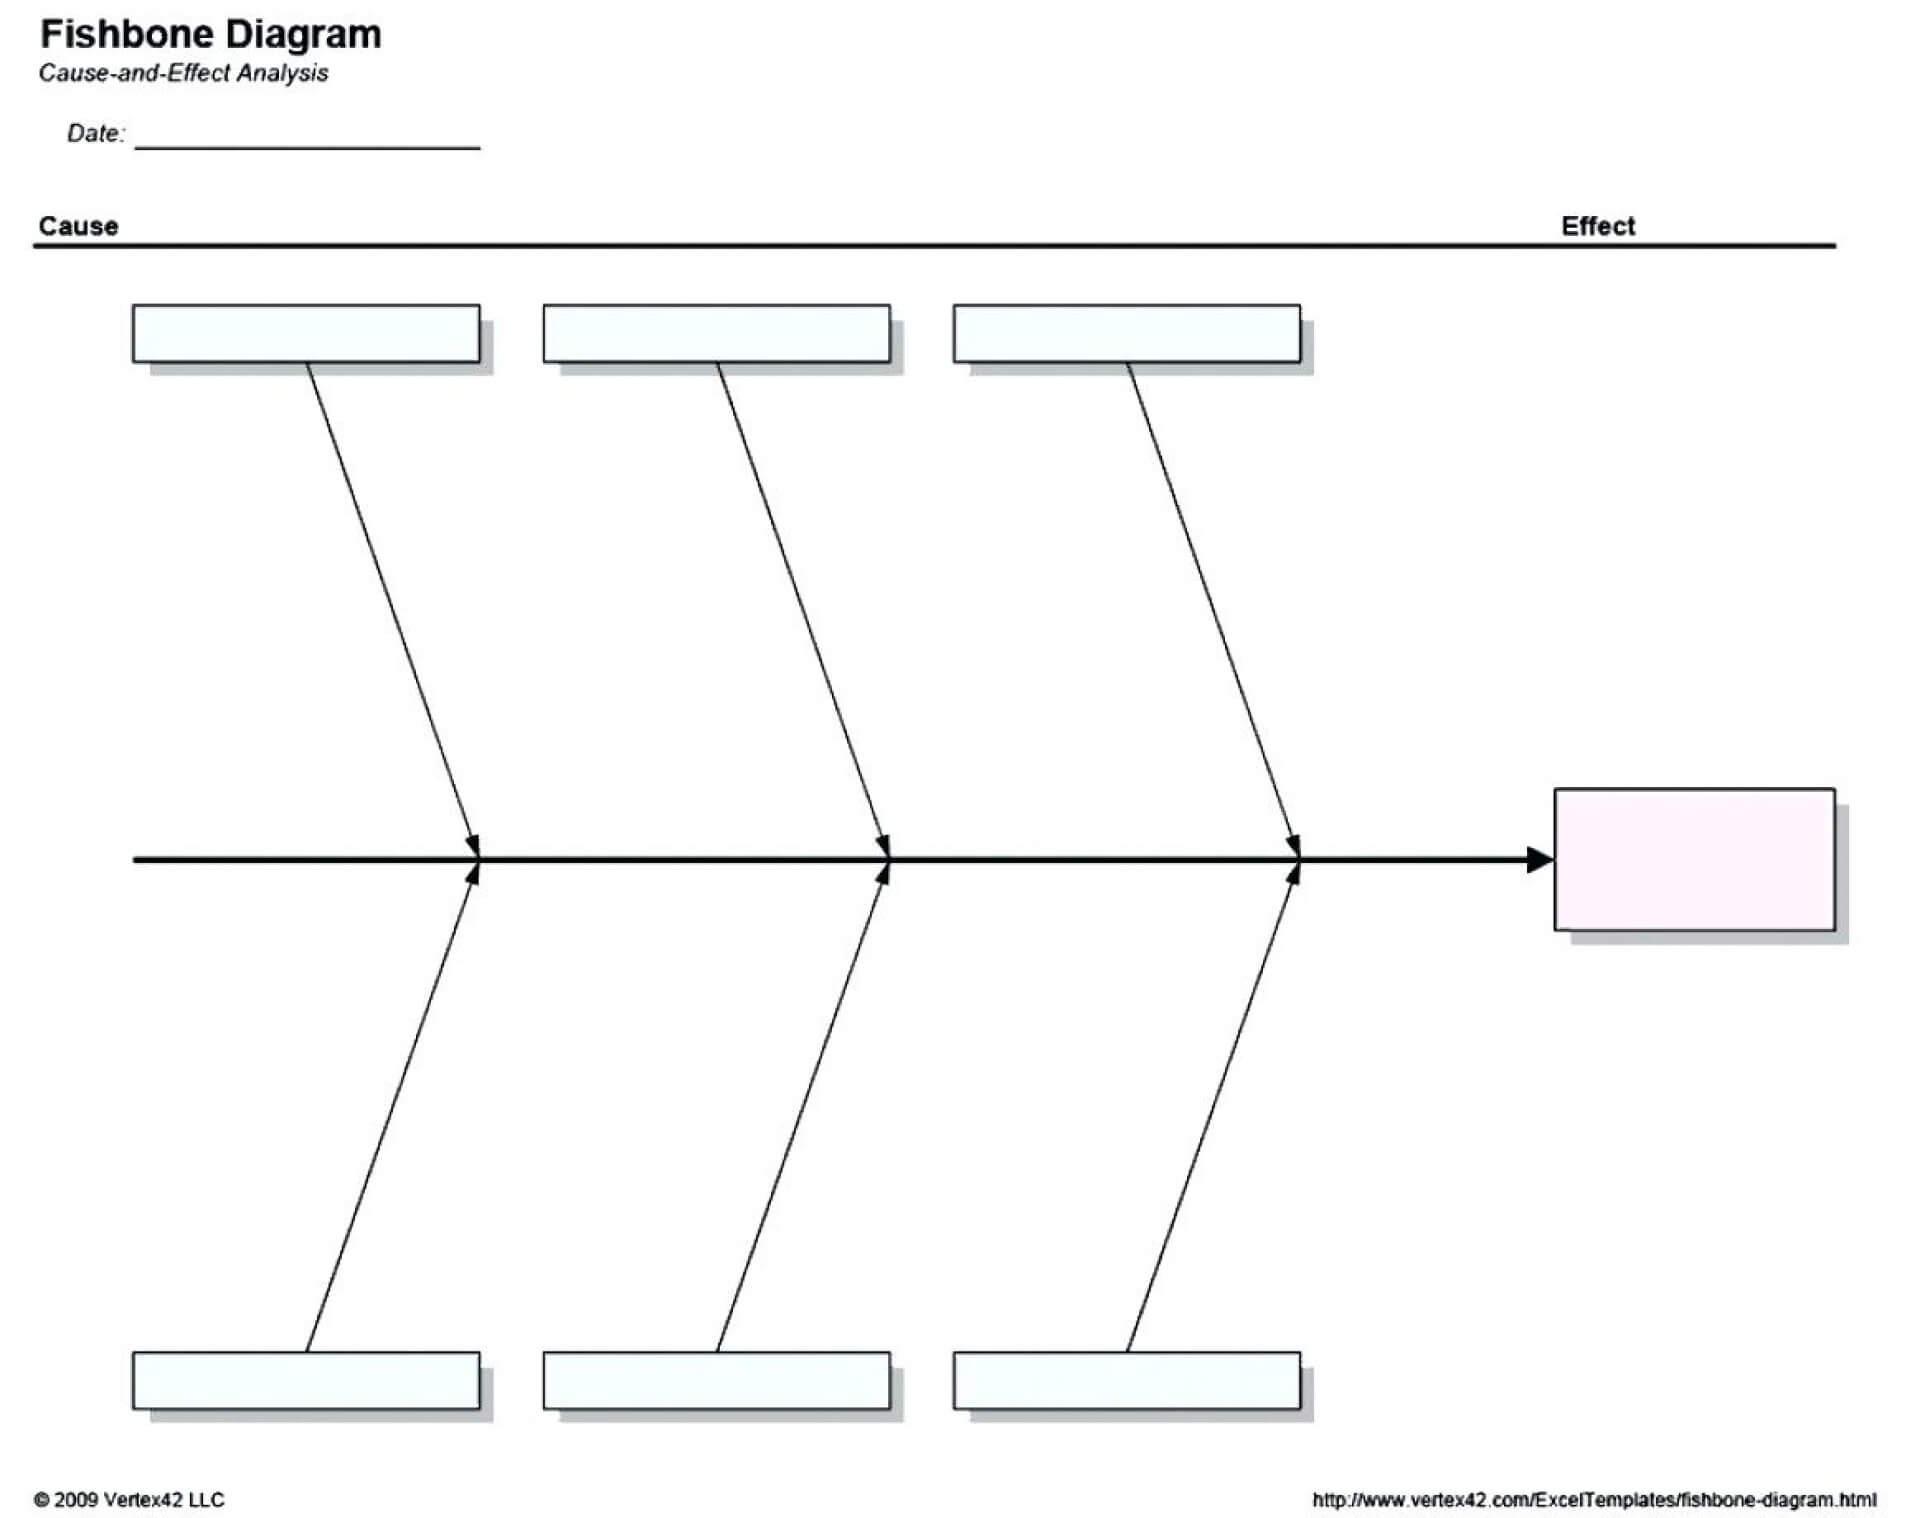 001 Template Ideas Fishbone Diagram Word Exceptional Doc throughout Blank Fishbone Diagram Template Word